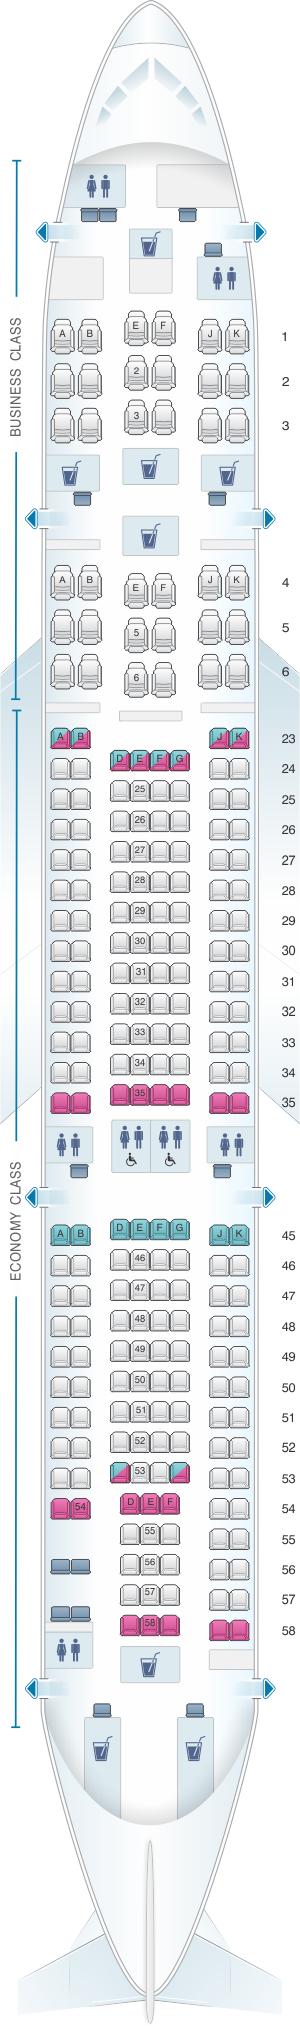 Seat map for Qantas Airways Airbus A330 200 International 235PAX